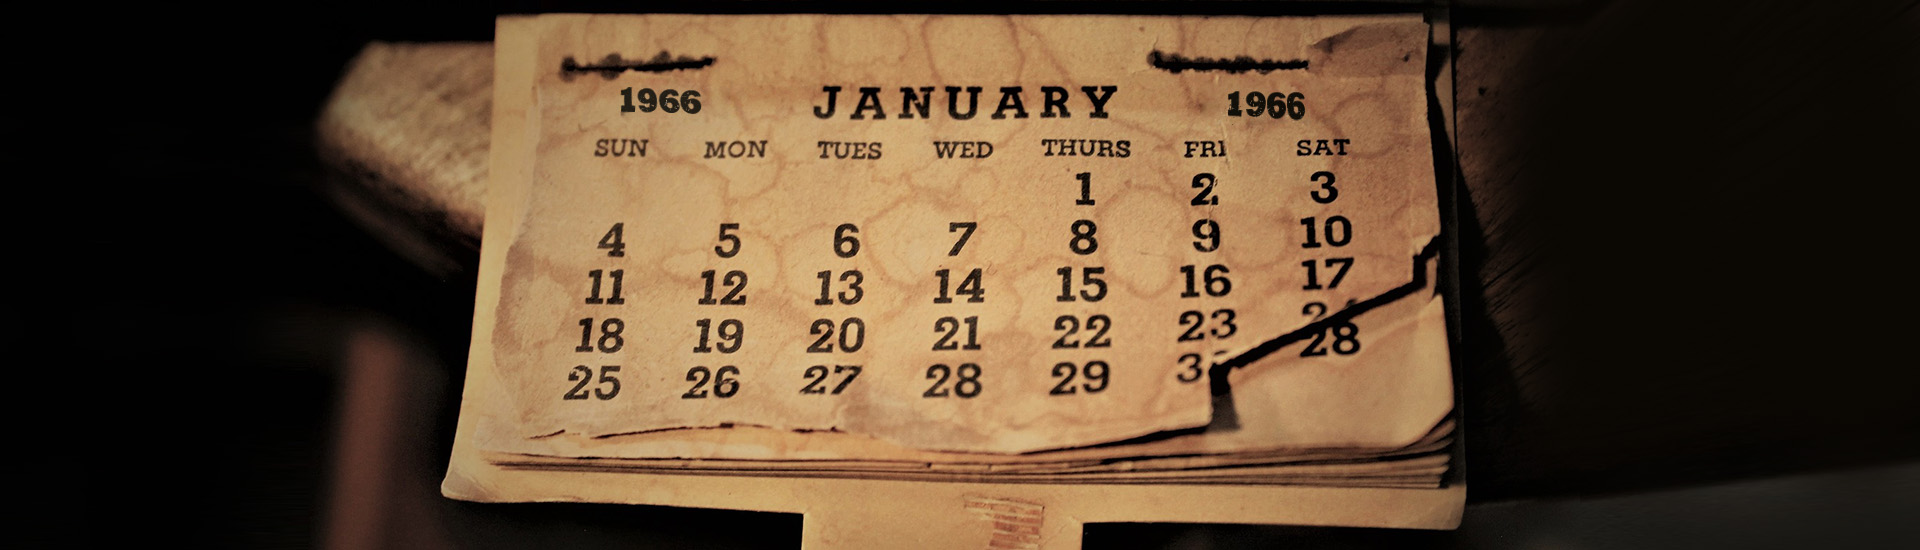 Calendar 1966